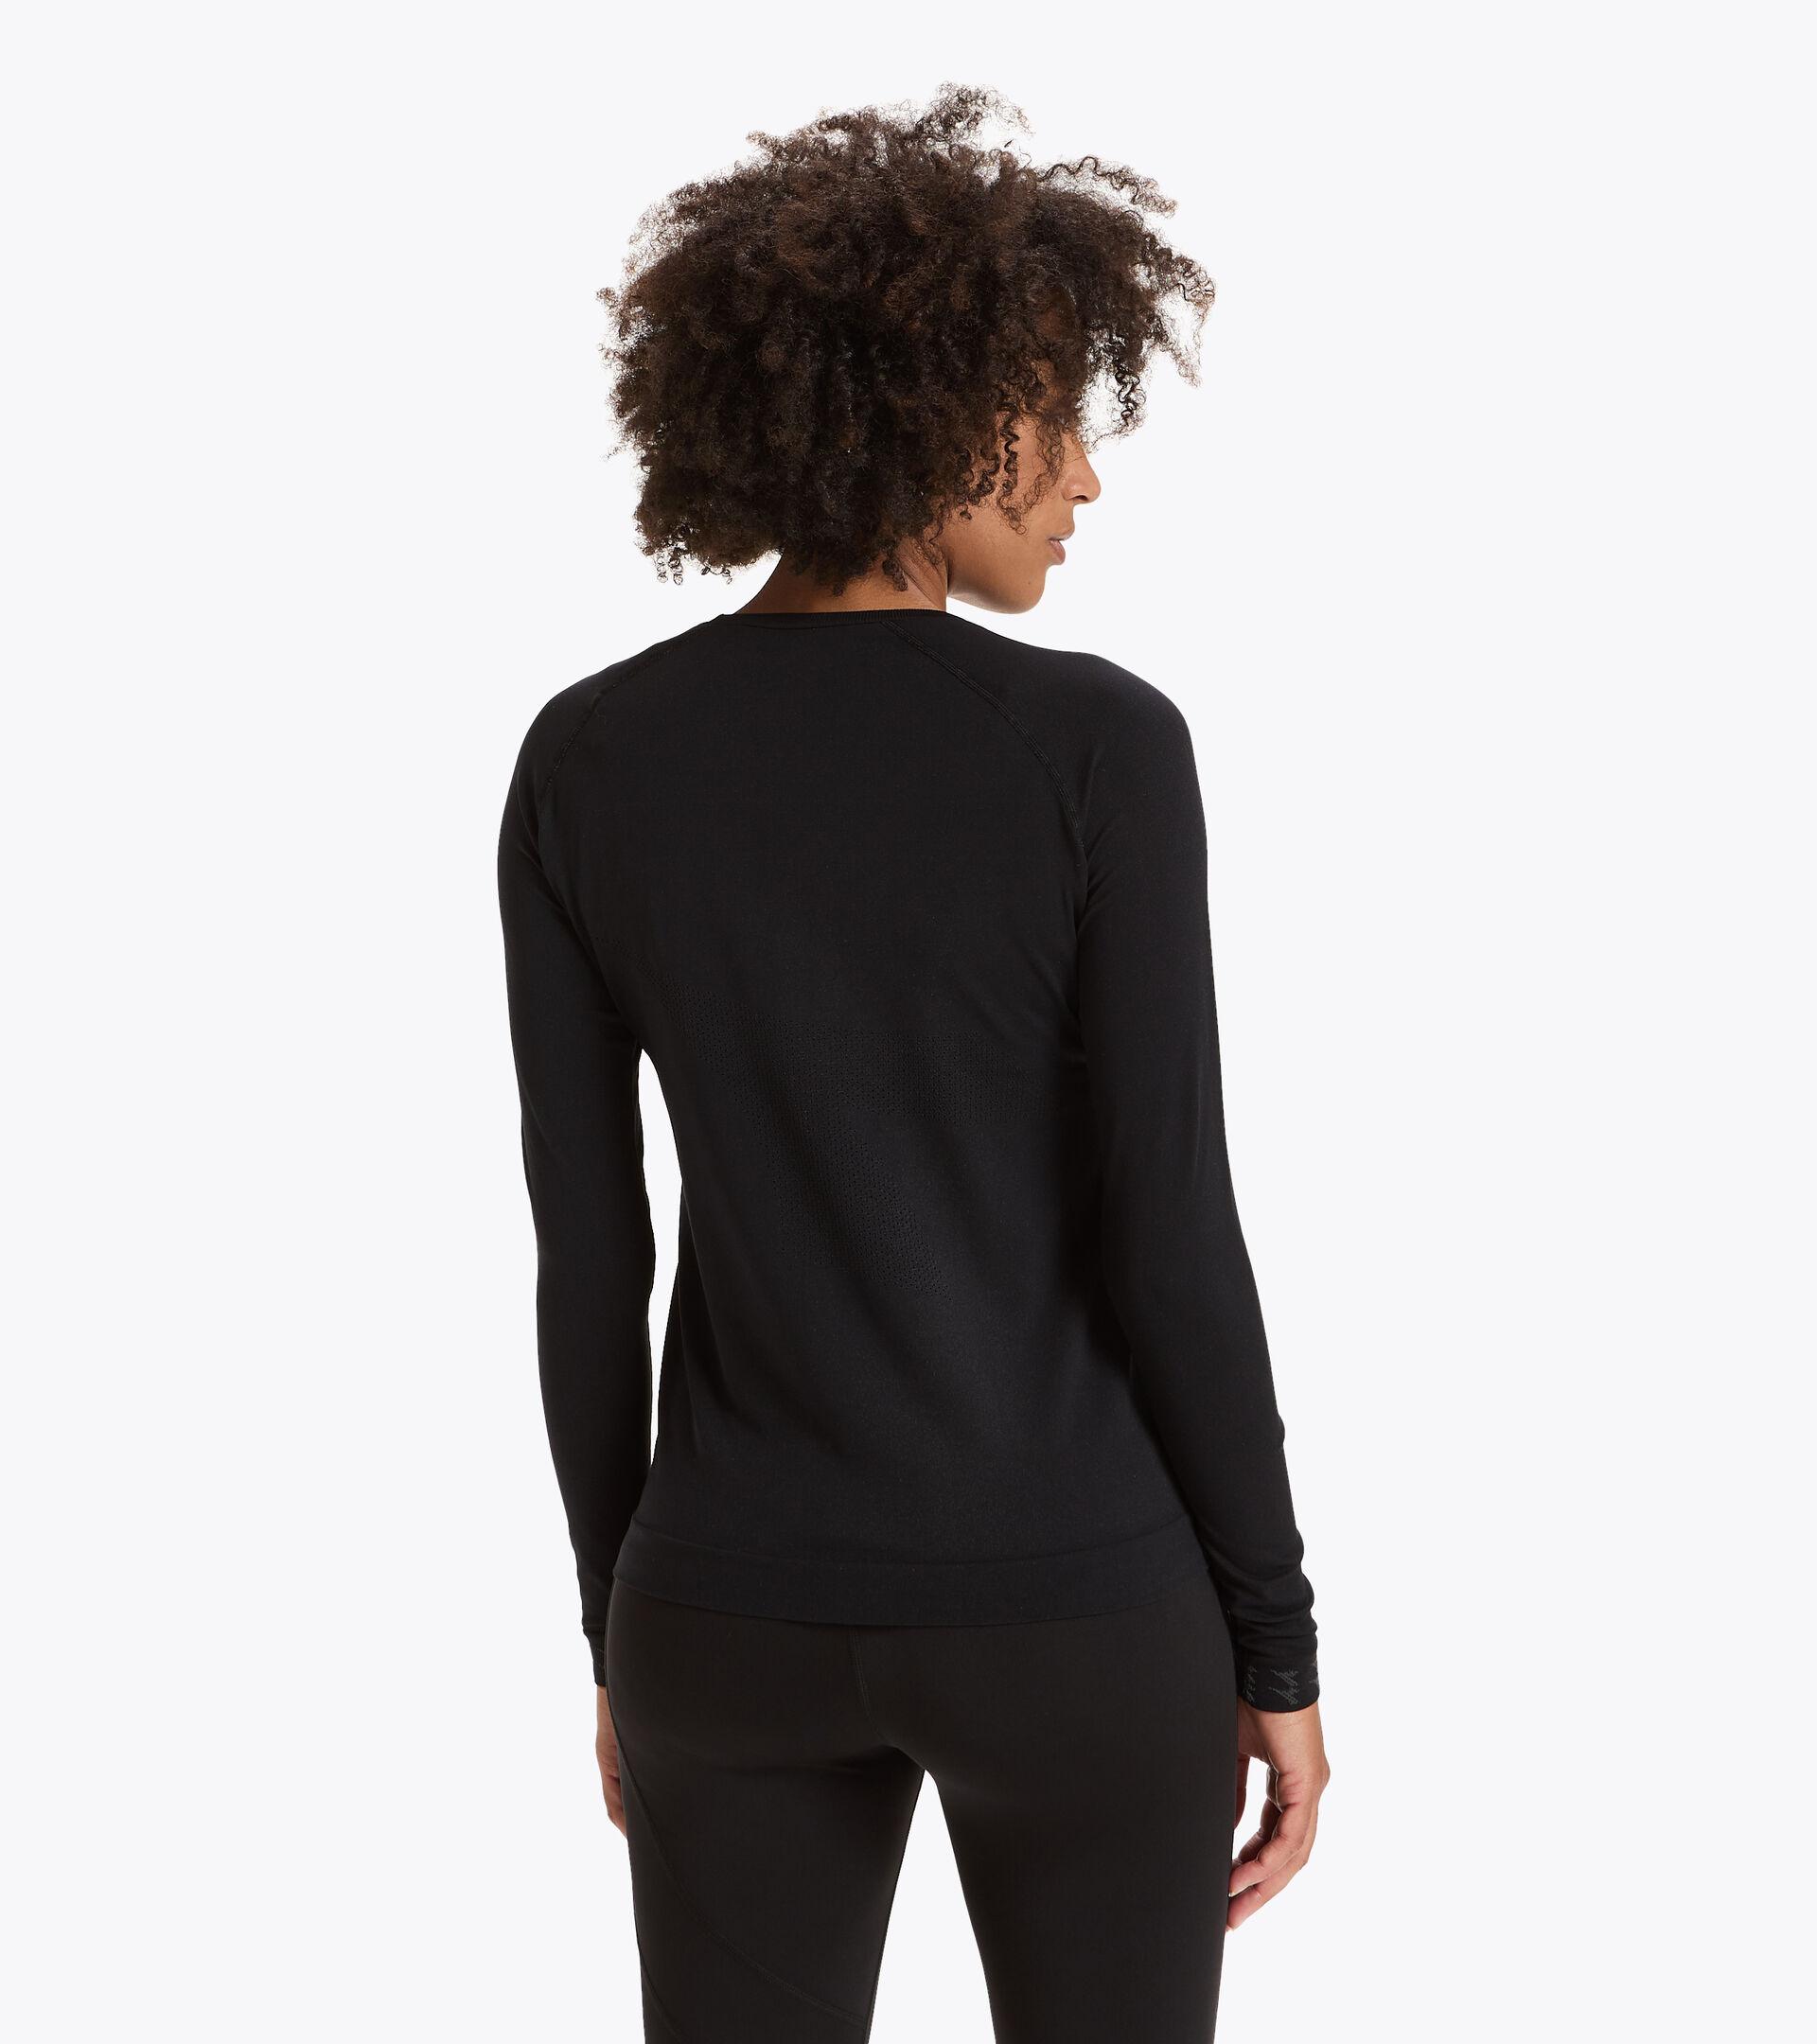 Camiseta para correr Made in Italy - Mujer L. LS SKIN FRIENDLY T-SHIRT NEGRO - Diadora